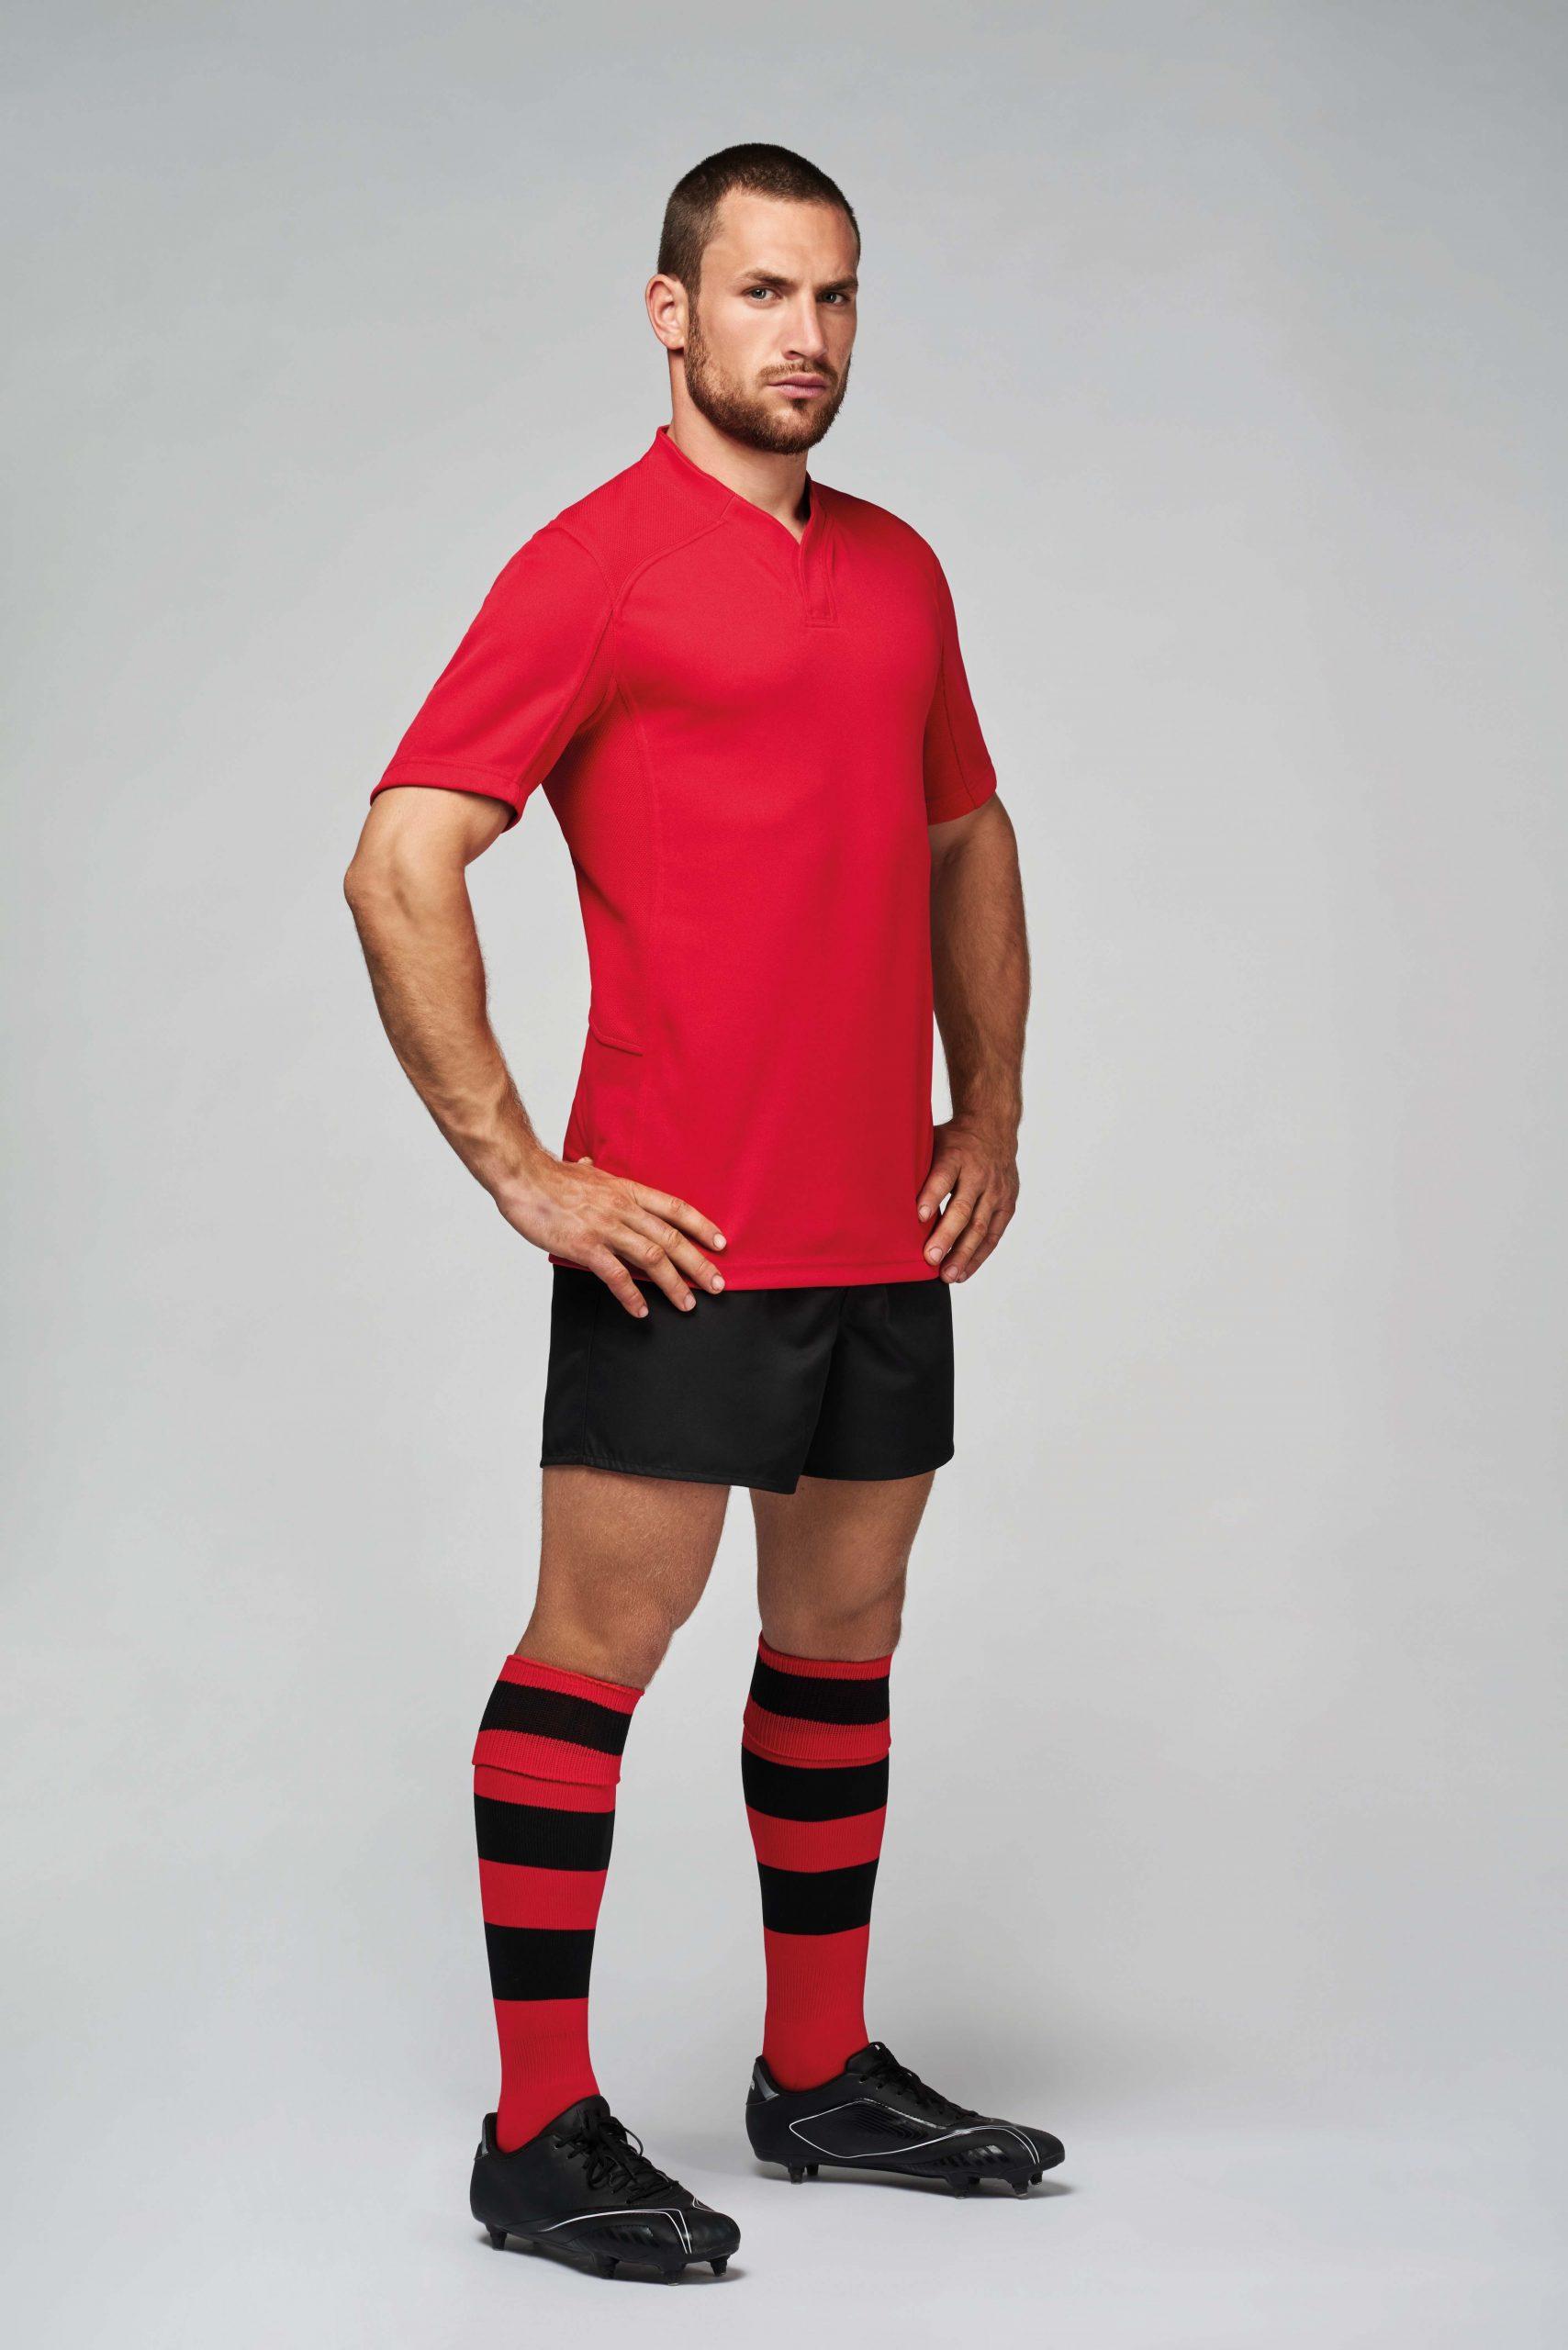 Rugby Shorts Unisex